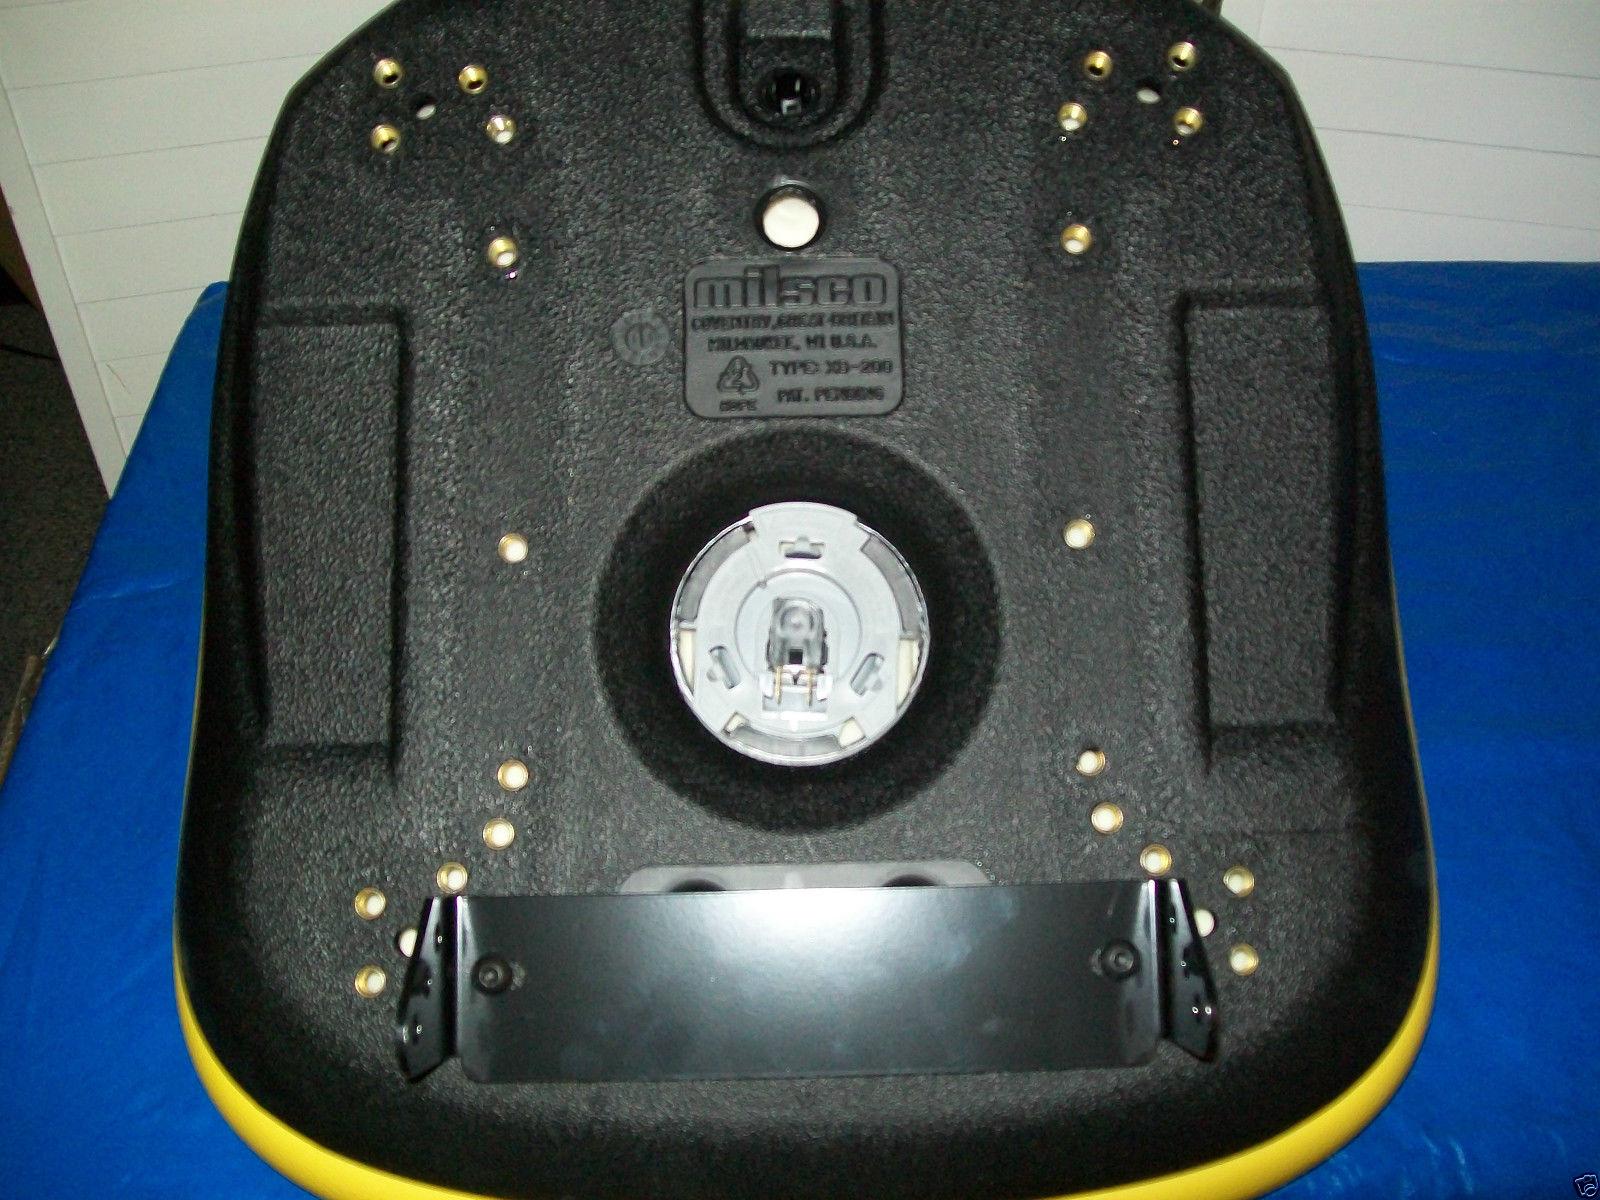 Camo Seat John Deere X485 X495 X575 X585 595 720 724 728 740 748 Wiring Diagram 729 749 Fg